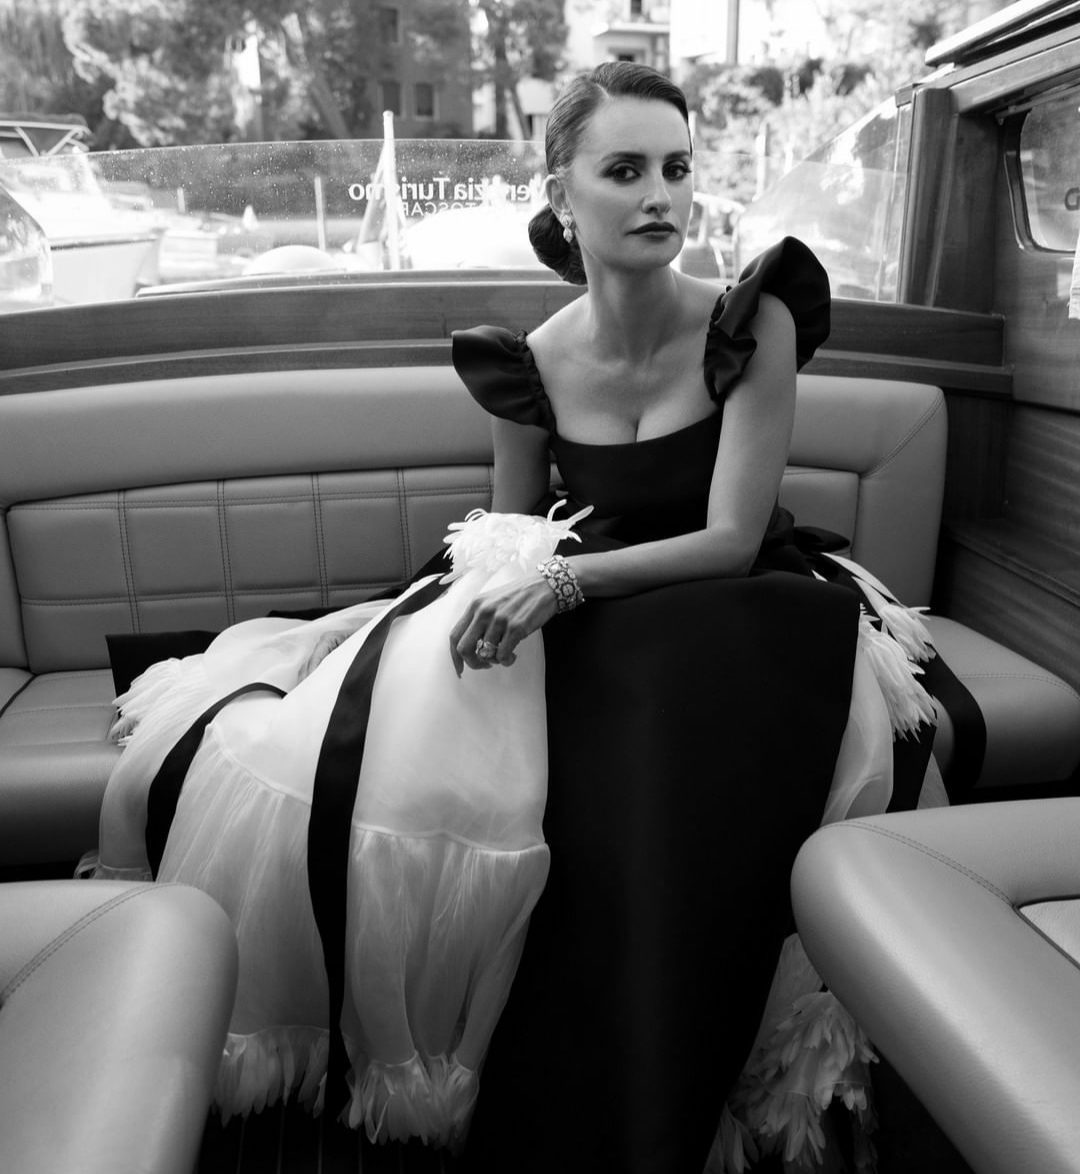 Penélope Cruz Χρειάστηκαν 300 ώρες για ολοκληρωθεί το Chanel φόρεμα της για το Φεστινάλ Κινηματογράφου της Βενετίας